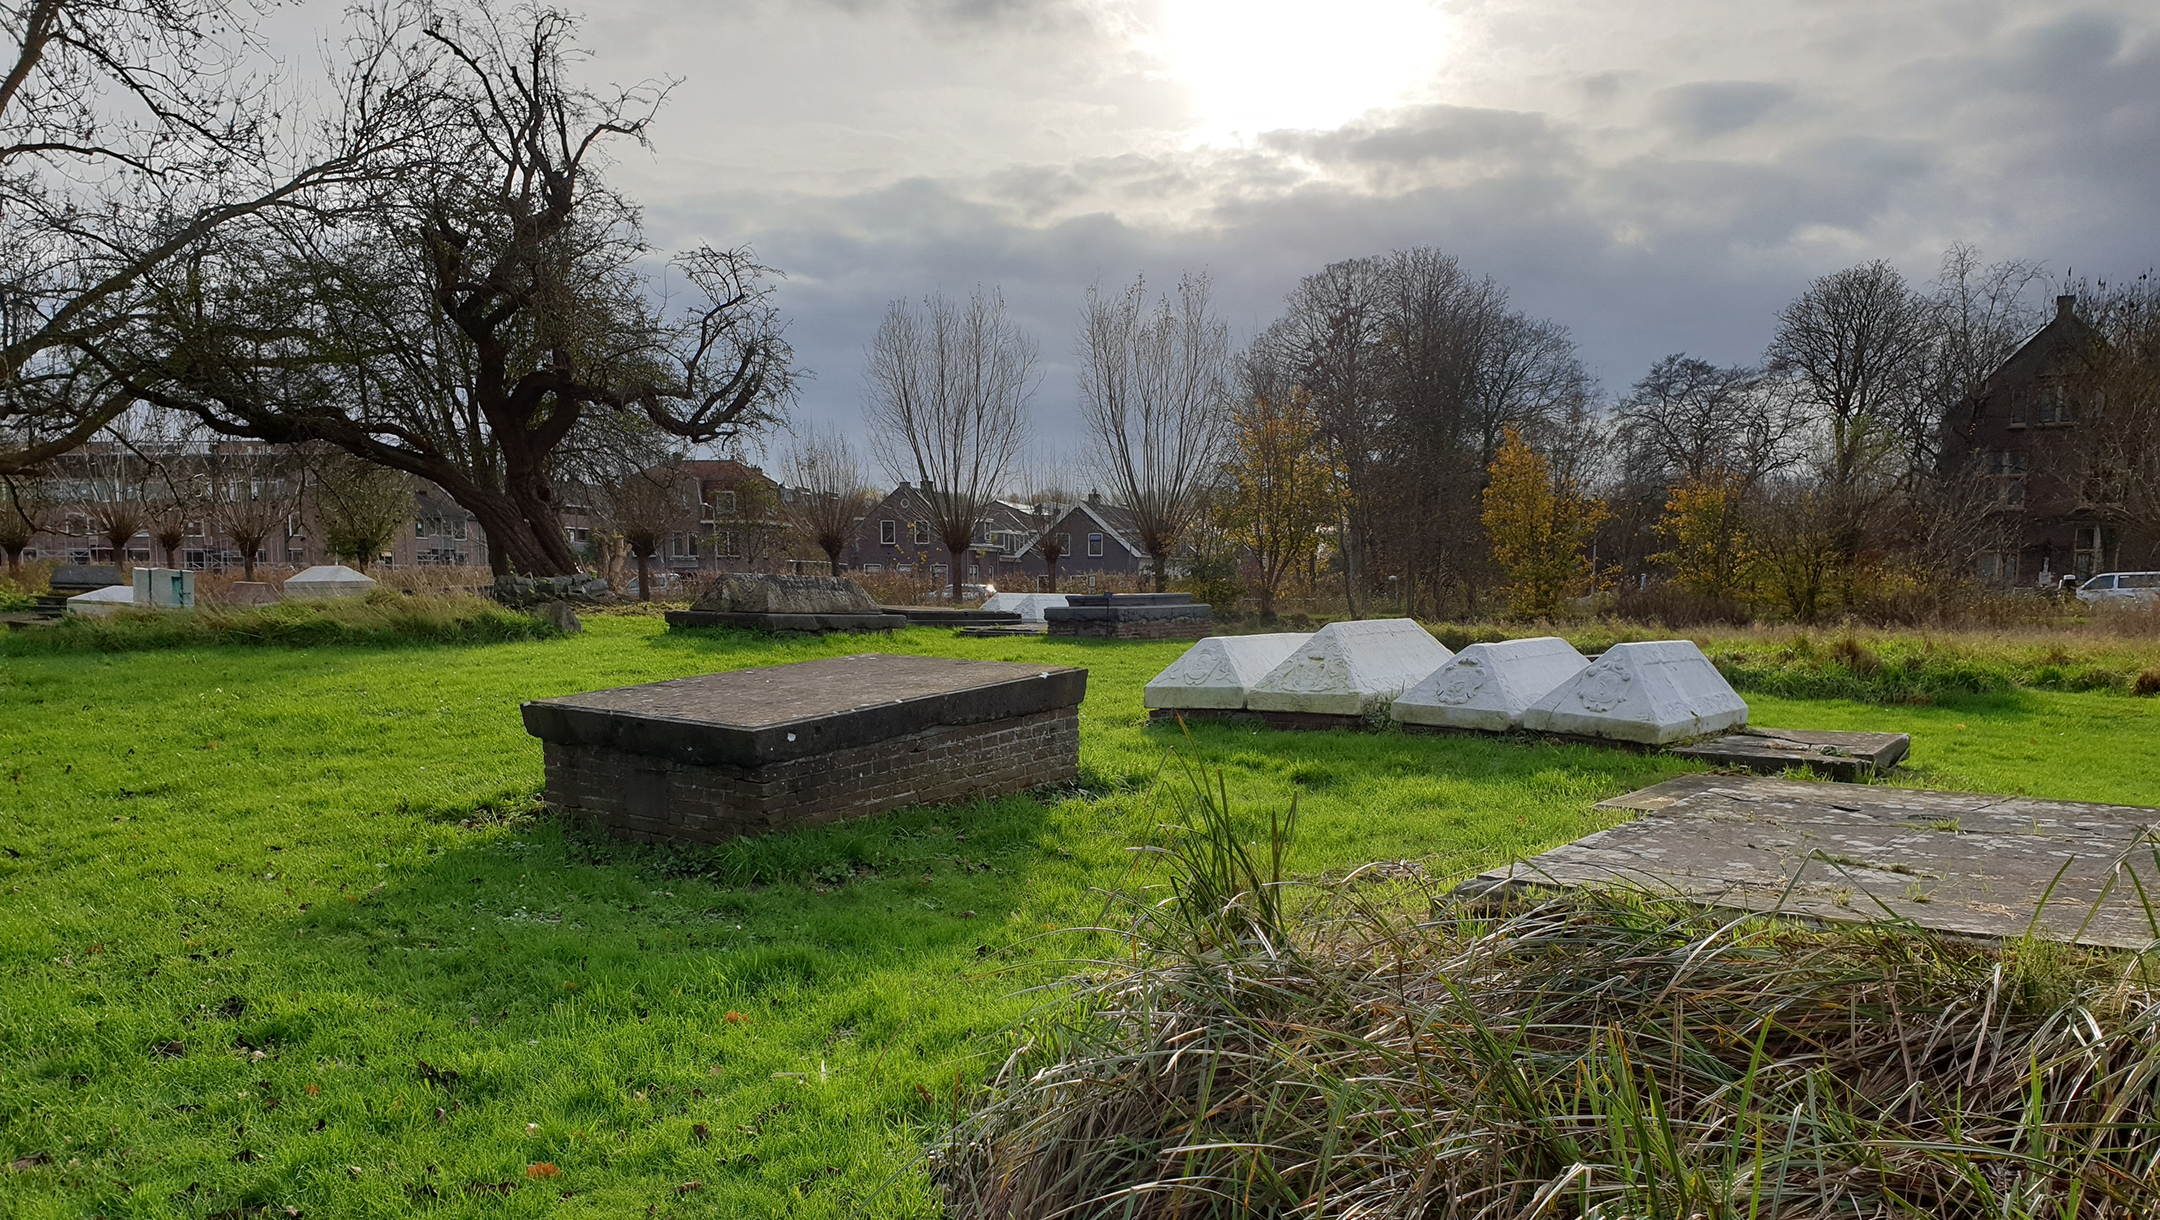 The Jewish cemetery in Ouderkerk aan de Amstel, the Netherlands on Nov. 20, 2020. (Cnaan Liphshiz)